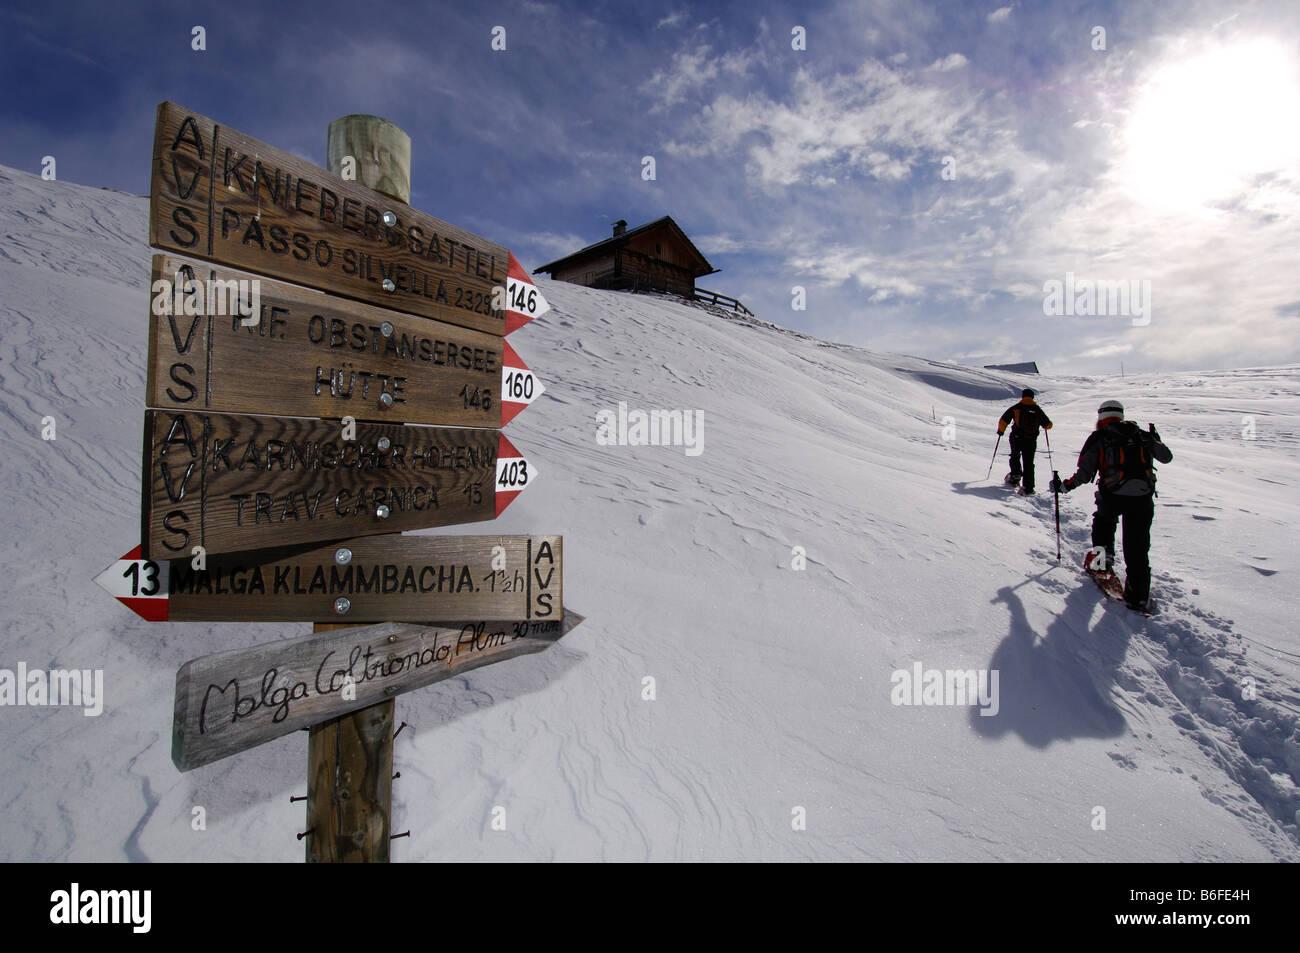 Cartel en silla Knieberg Kniebergsattel o raquetas de nieve, senderismo senderismo a Alpe Nemes, alta montaña Imagen De Stock